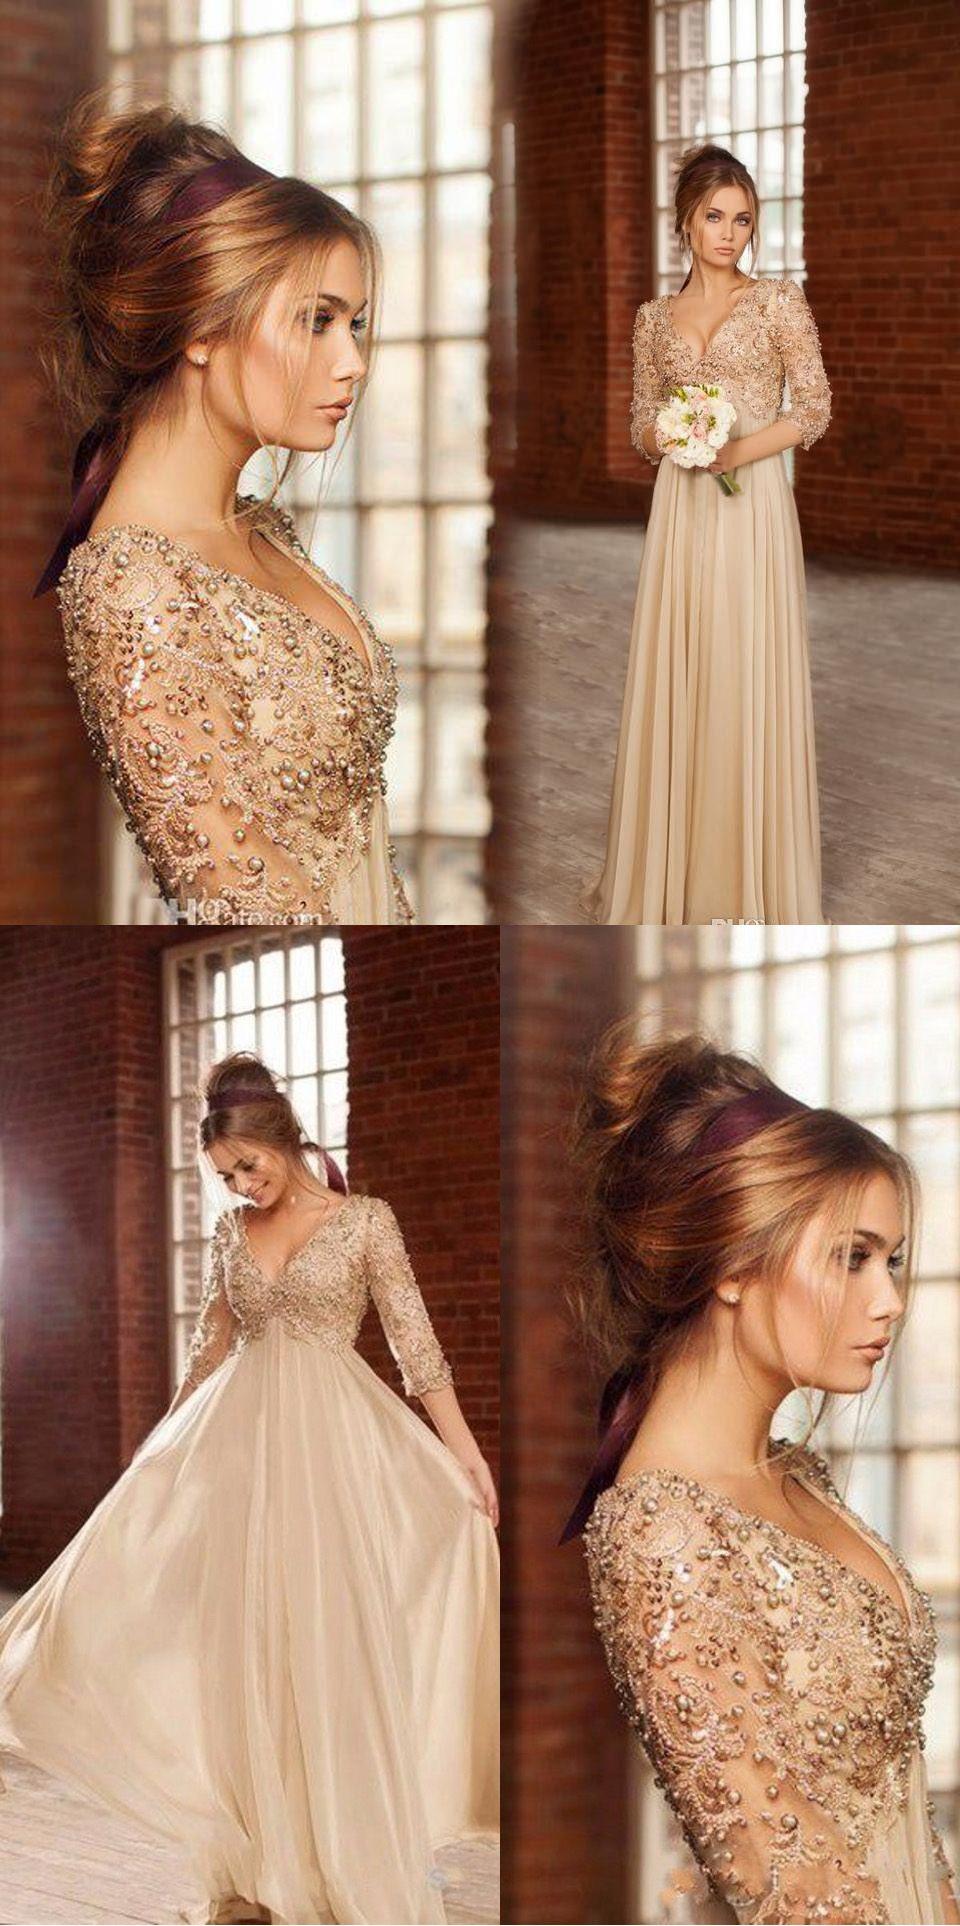 Chiffon prom dresseschampagne prom dressmodest prom gownpearl